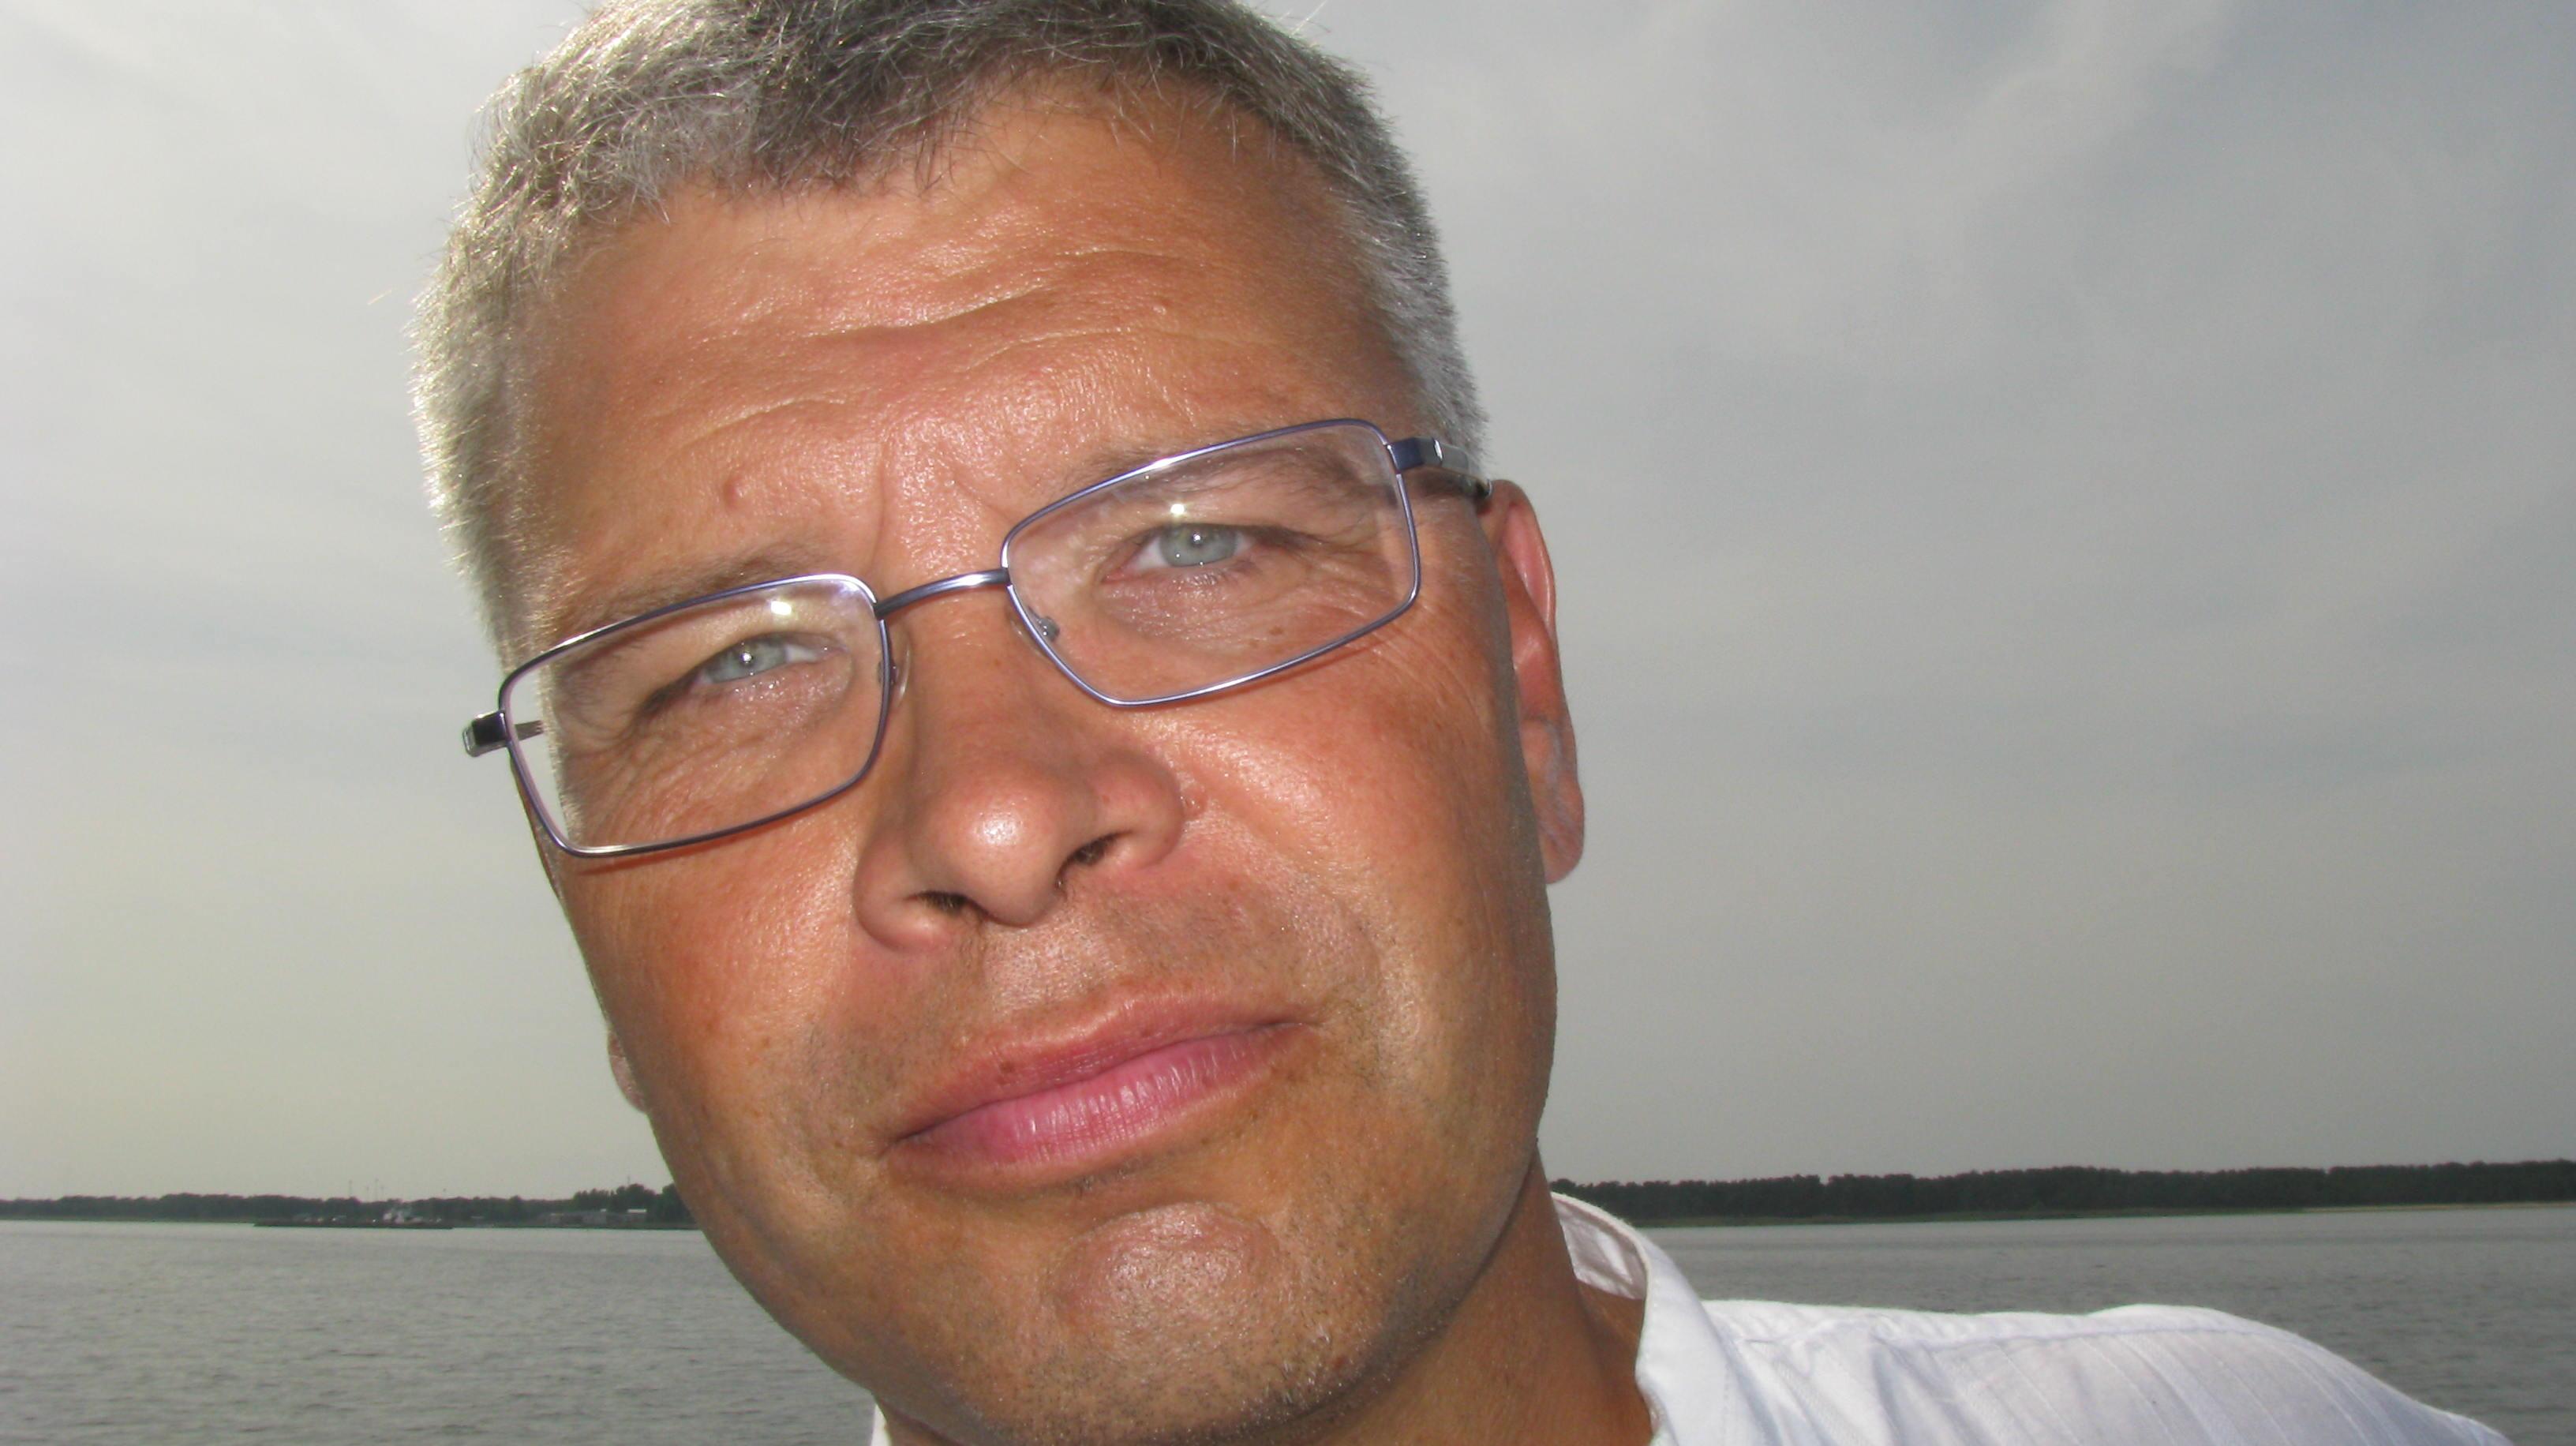 Carl-Gustav Linden